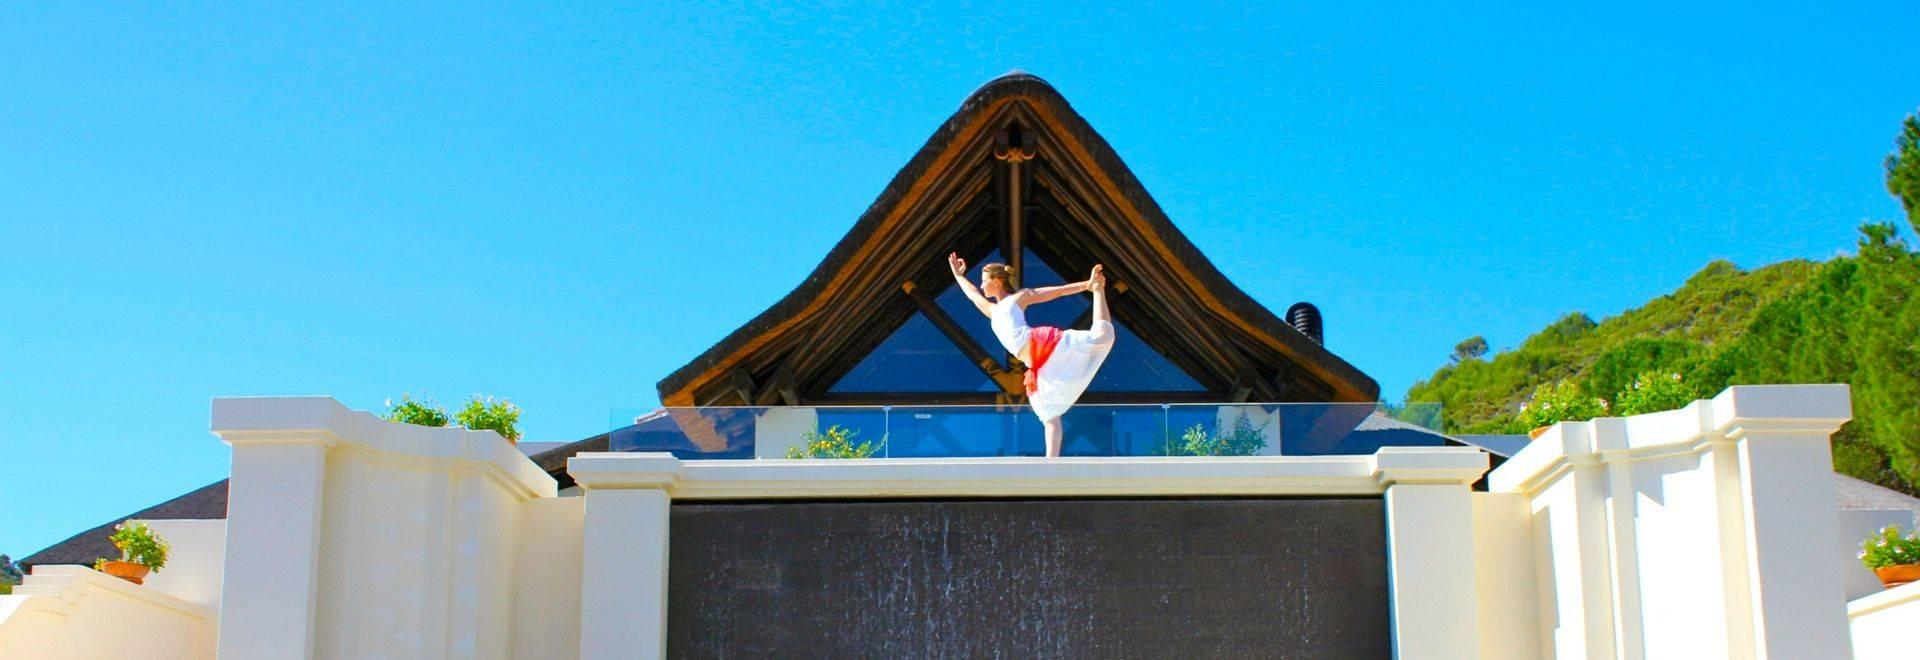 Shanti-Som-yoga-hotel-entrance.JPG